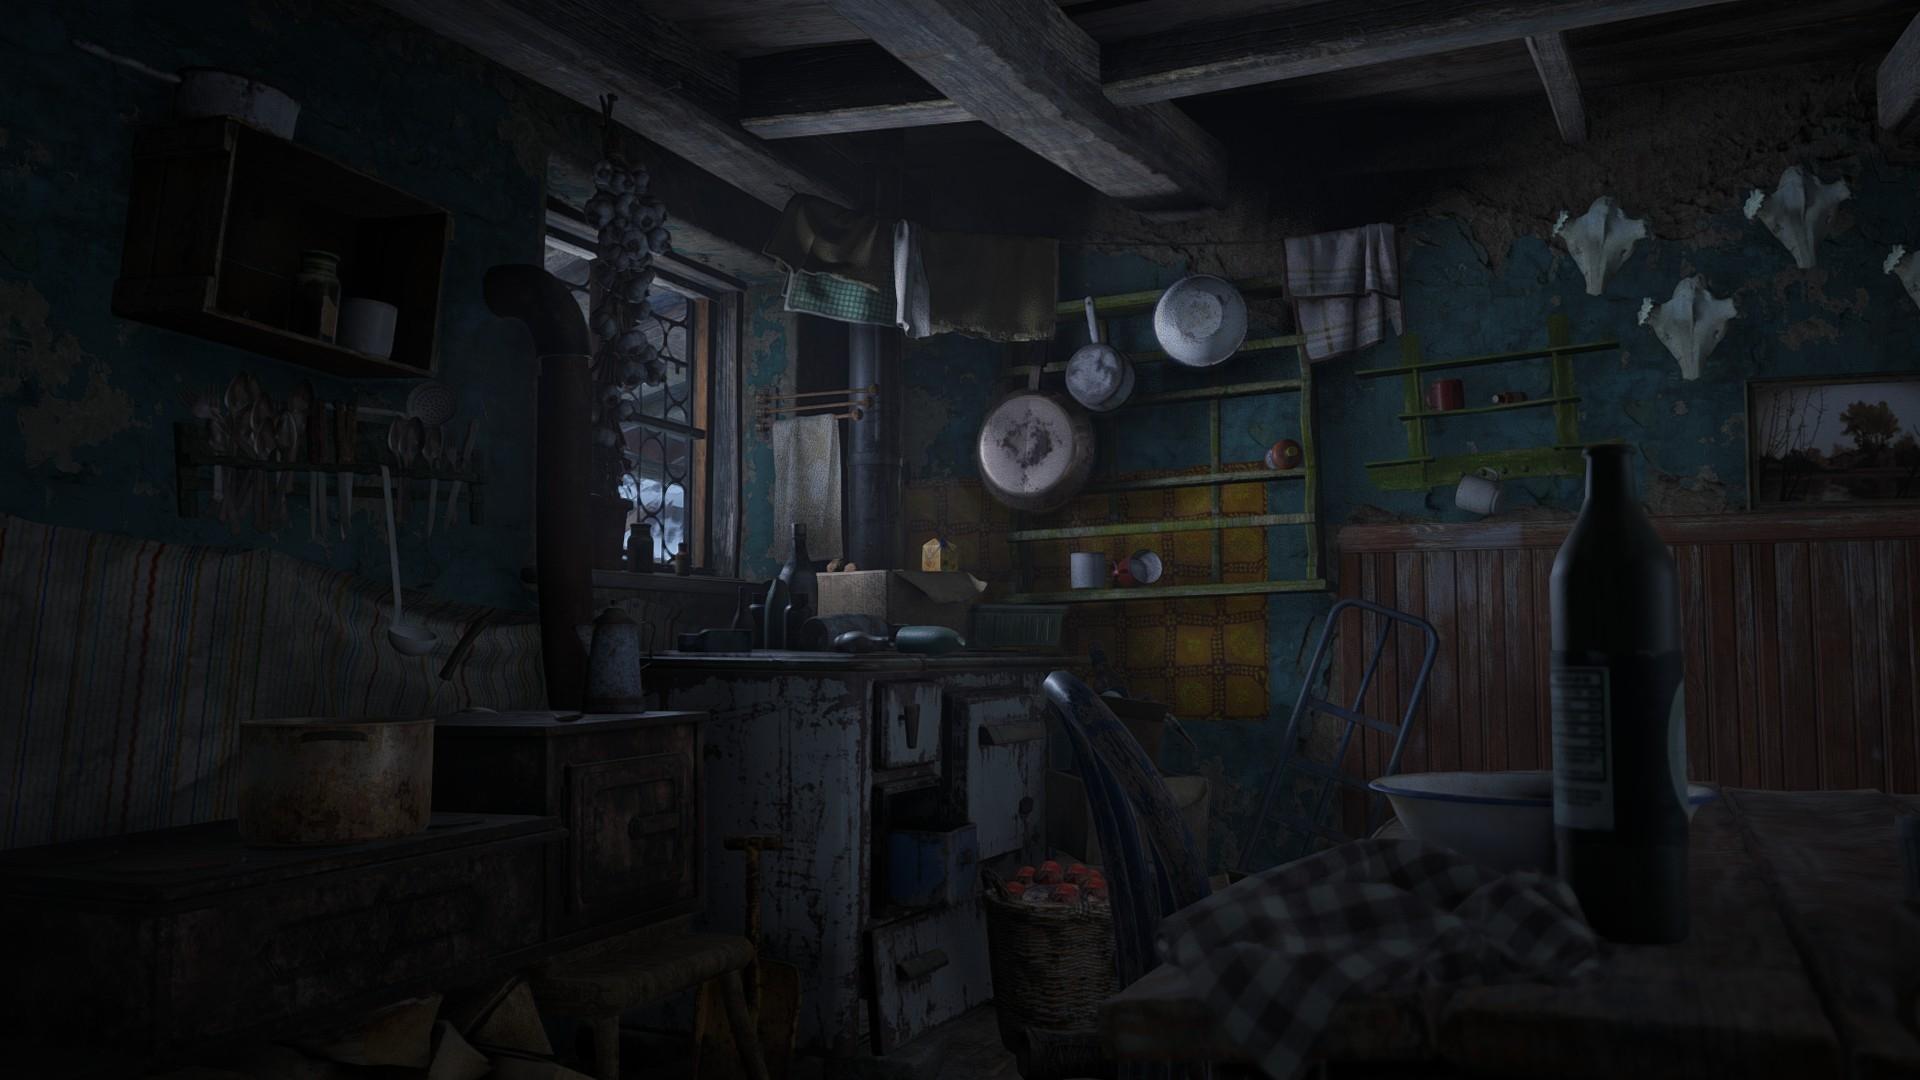 Resident Evil Village - Launch | ROW (6212f752-e678-4908-a4fc-5b7b0eb8ca98)